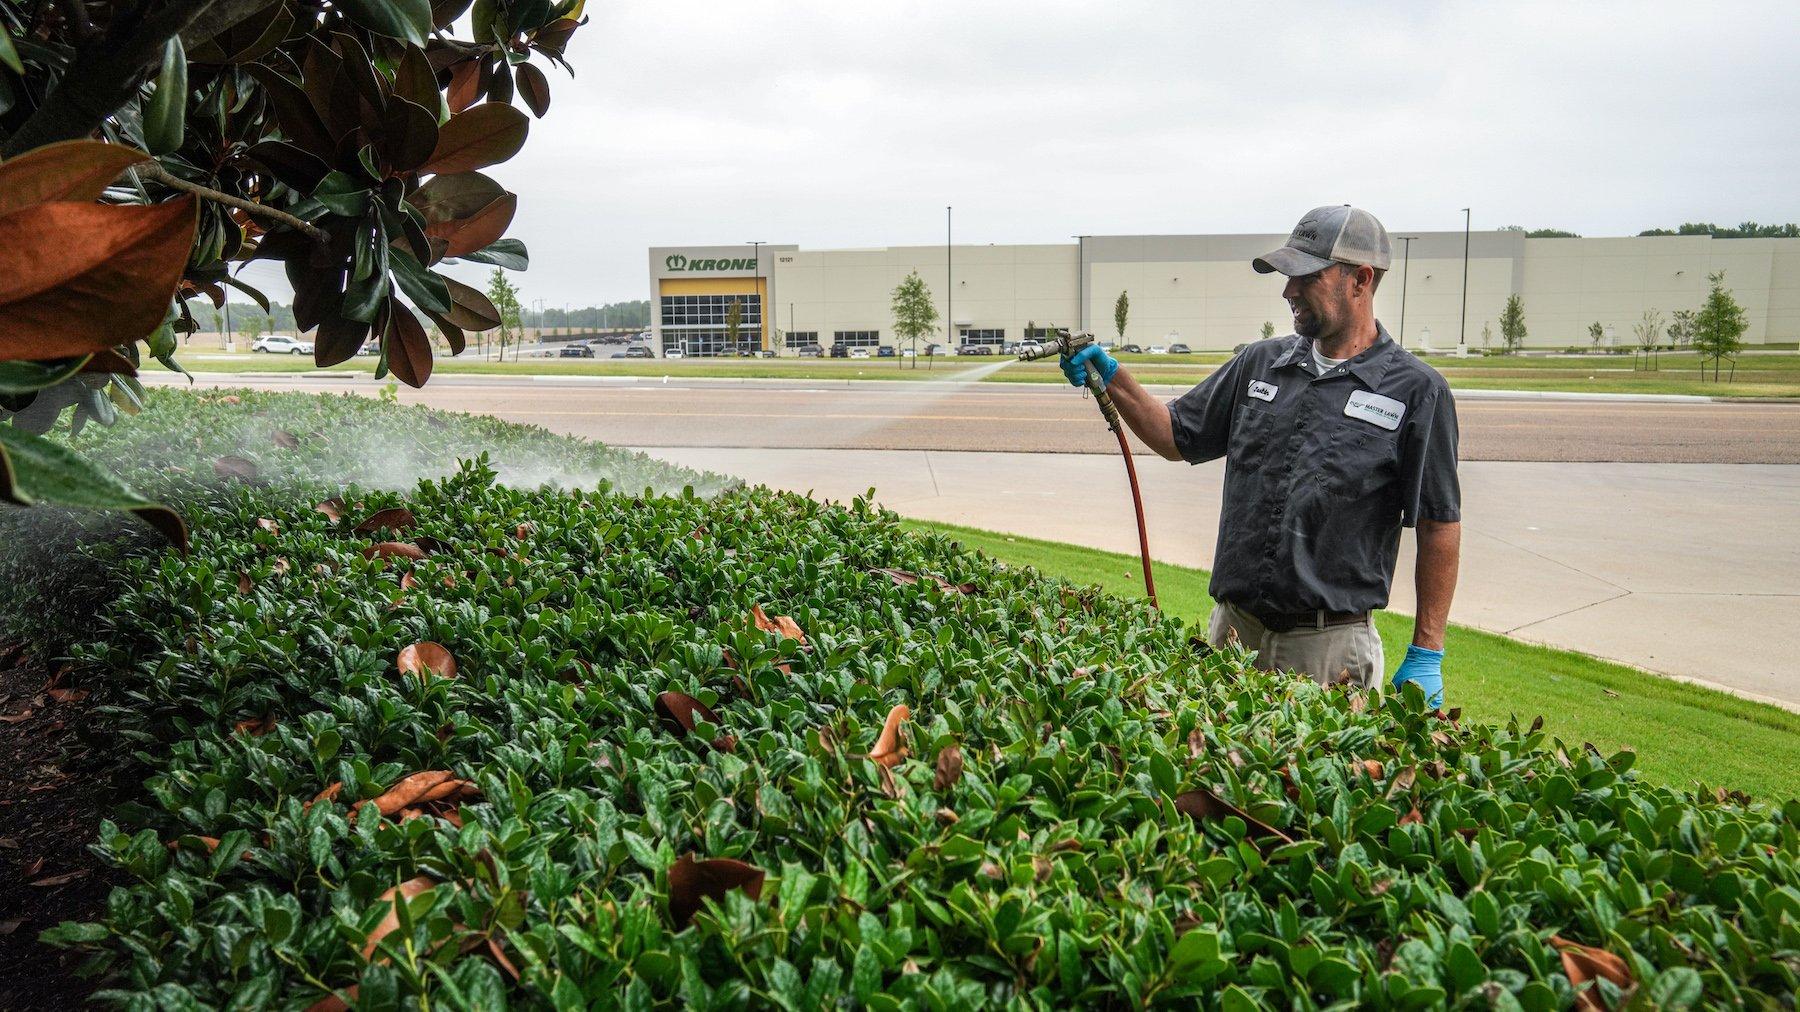 Technician spraying shrubs